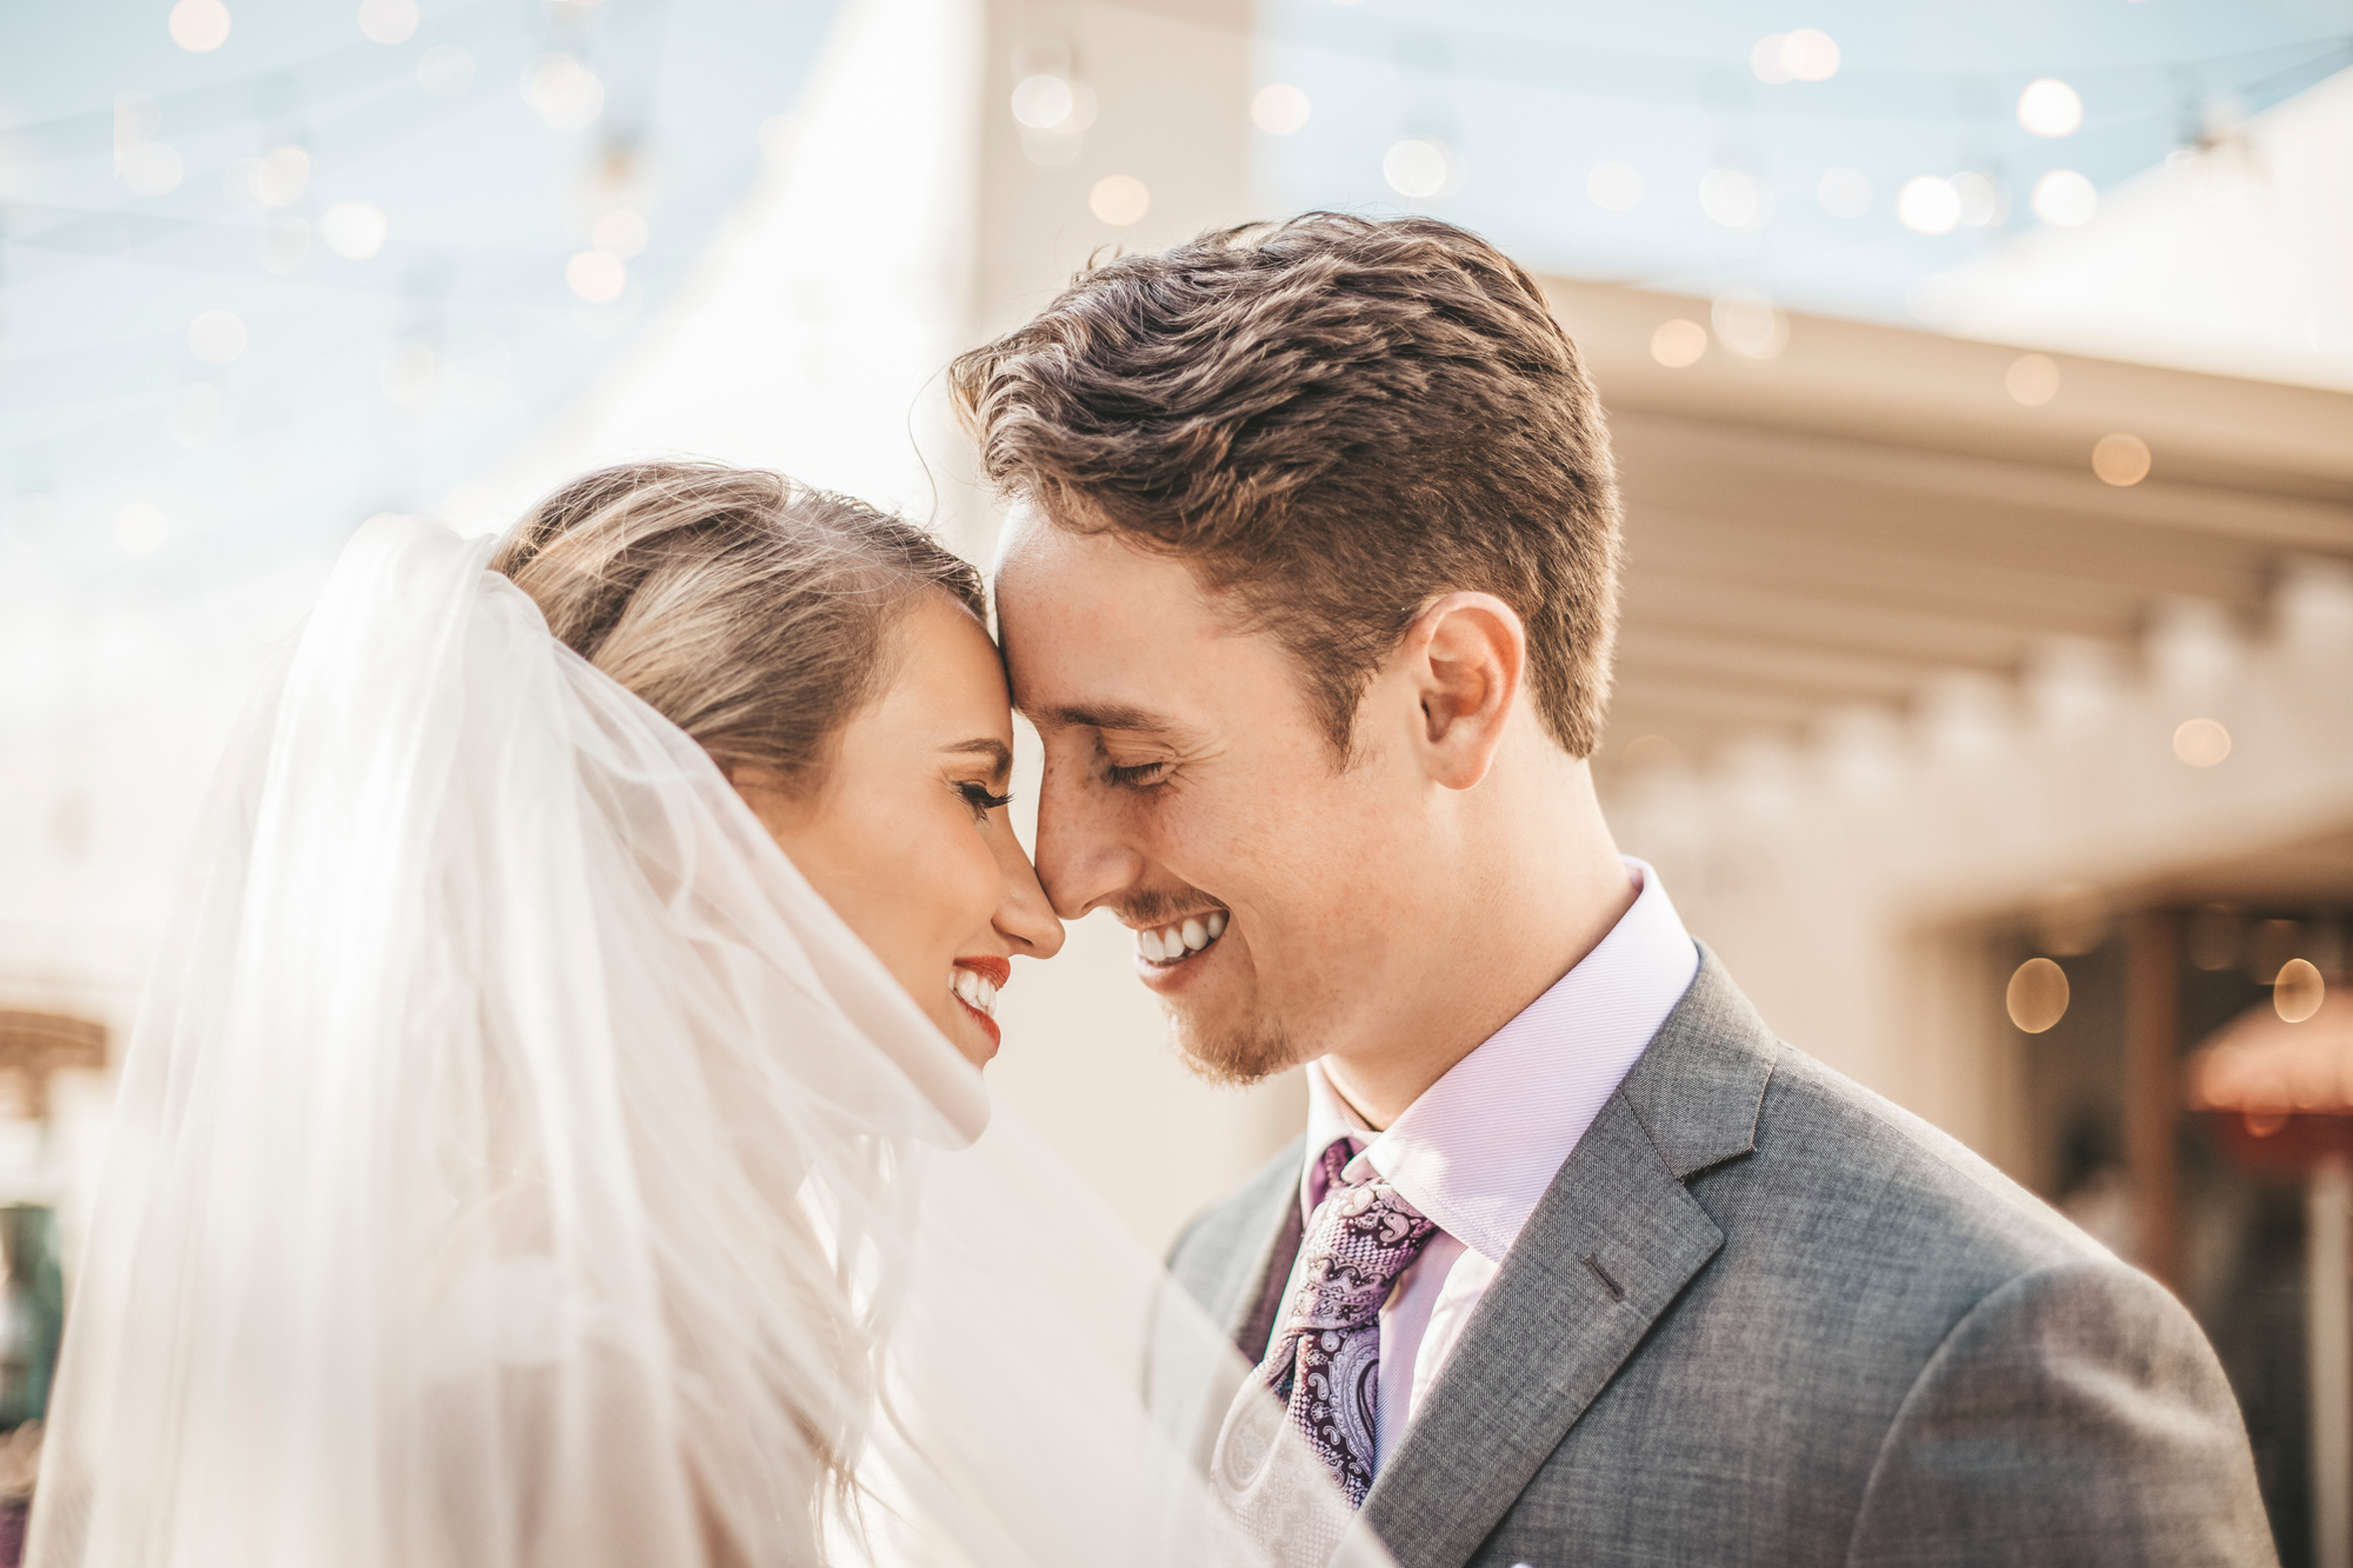 Wedding Photography/Videography